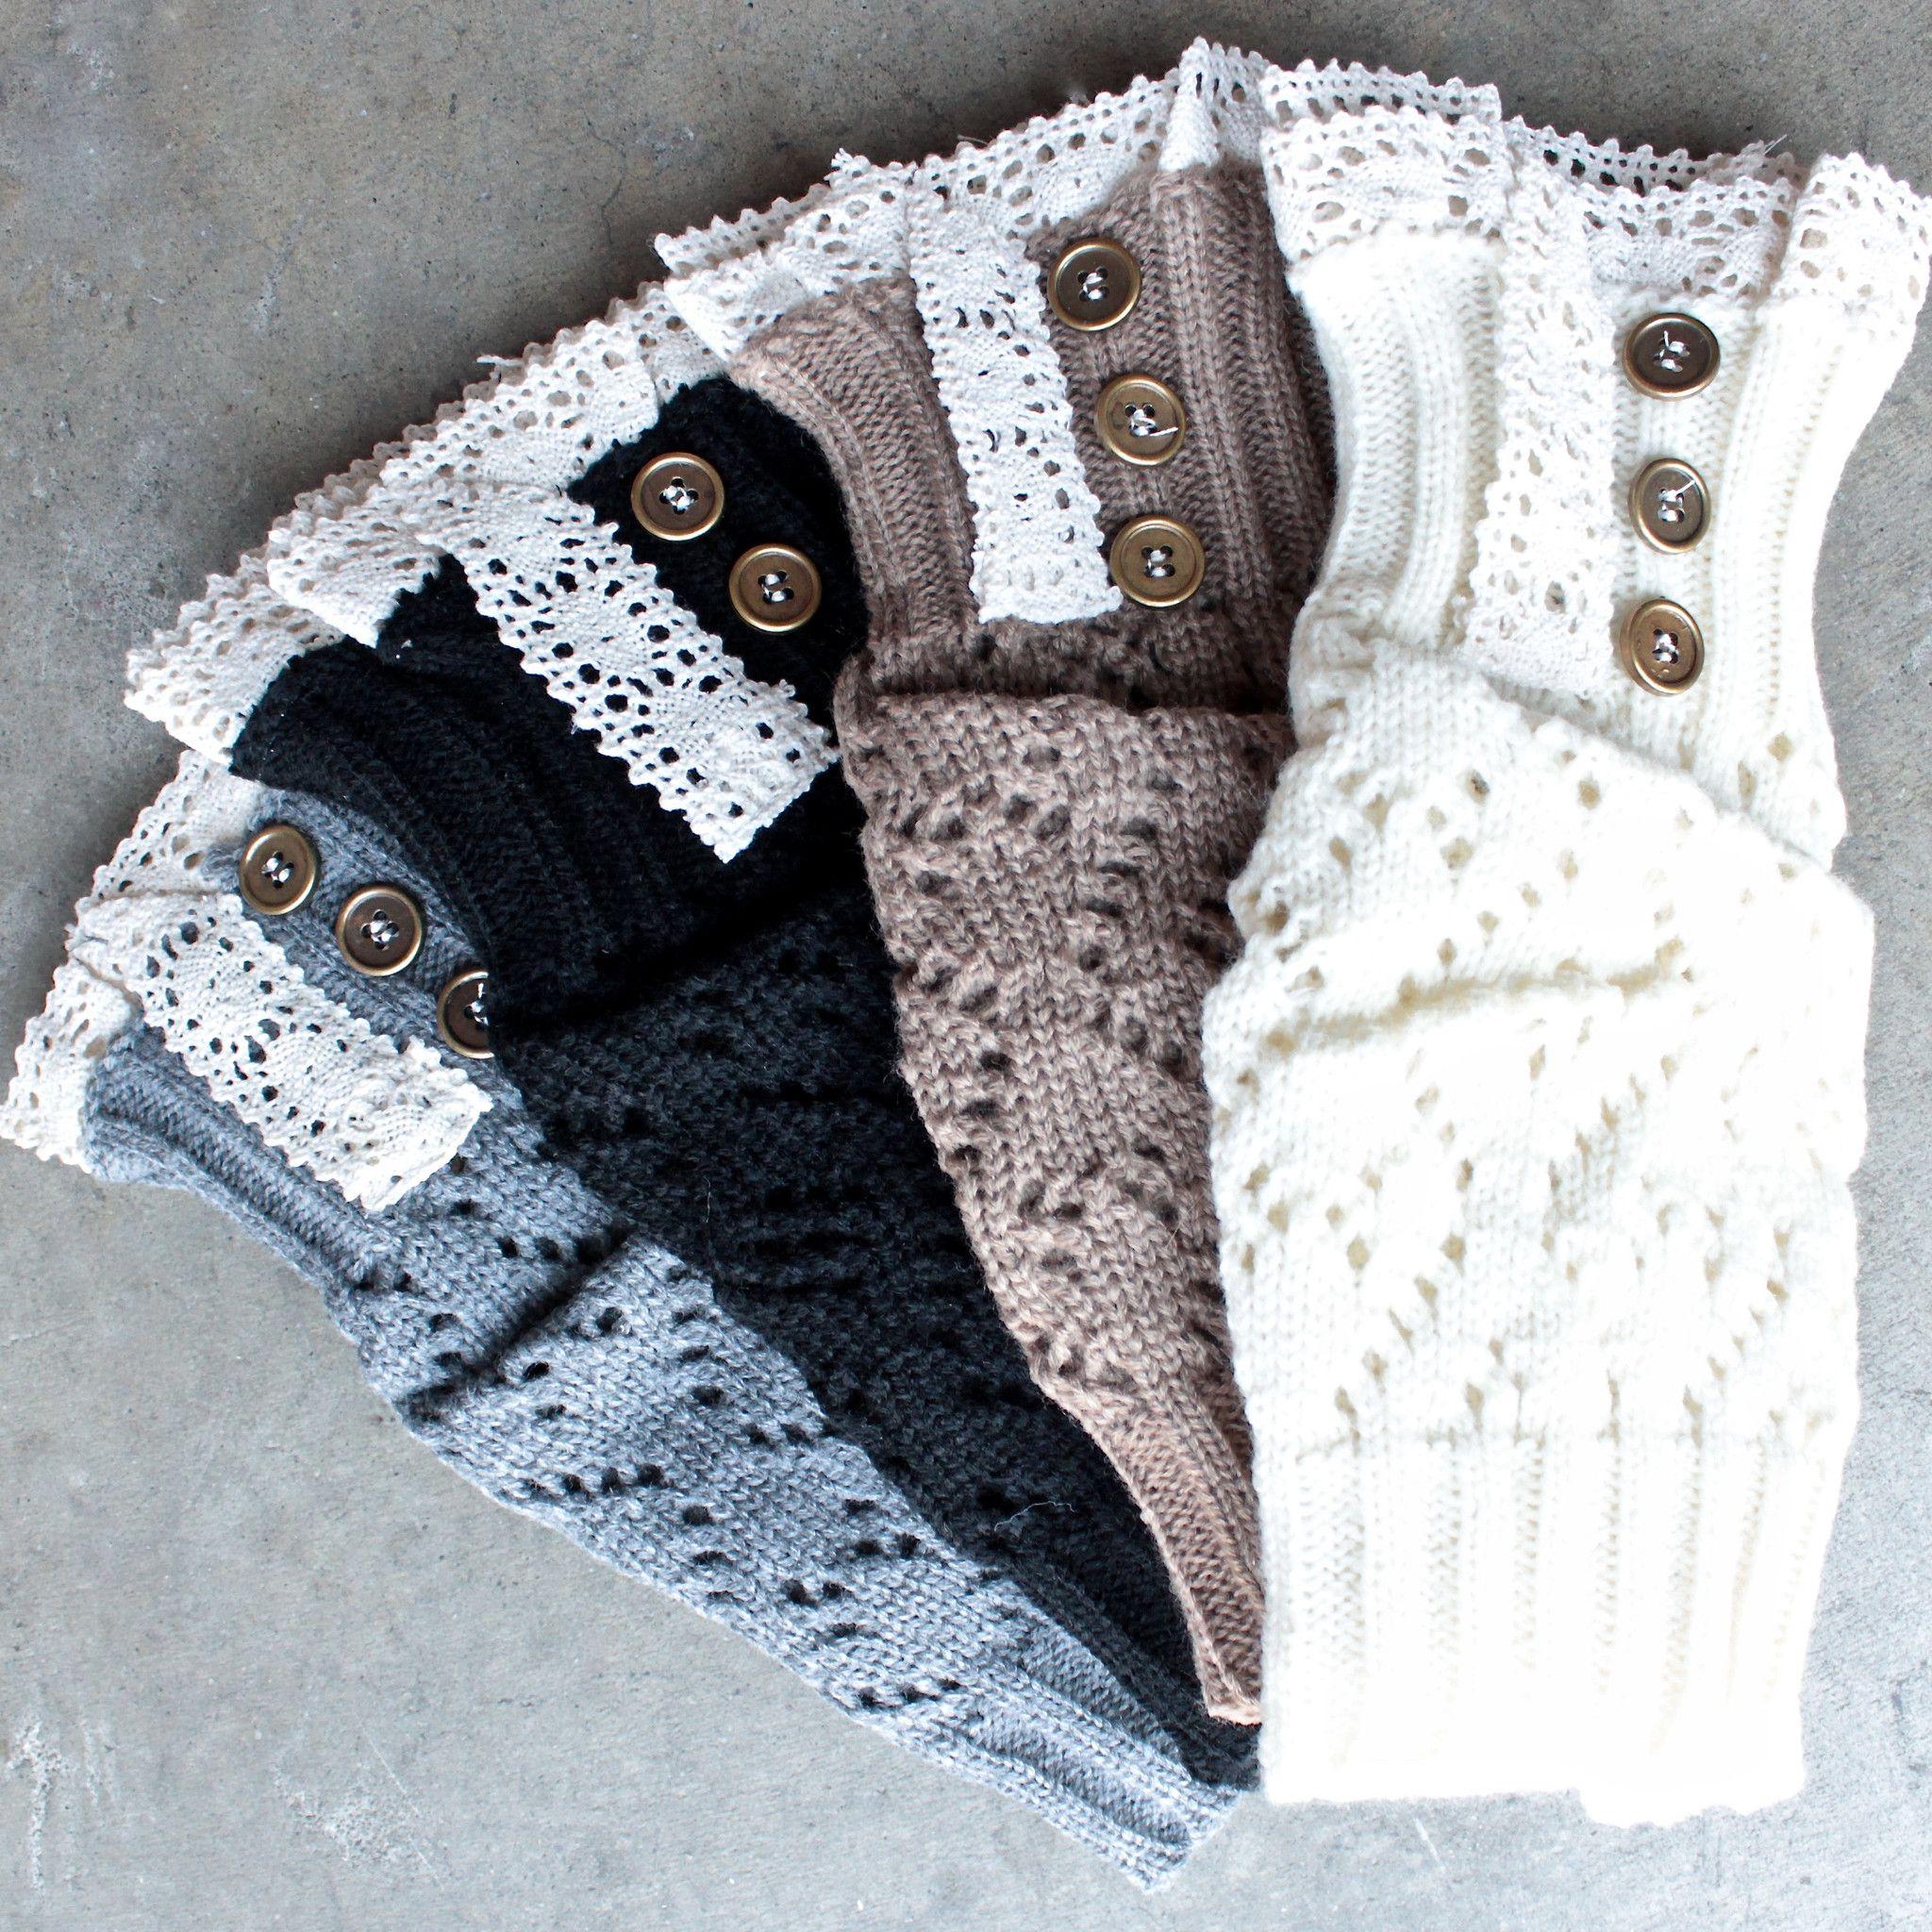 Knit lace 3 button boot cuffs (4 colors)   Botas, Medias y Todo moda